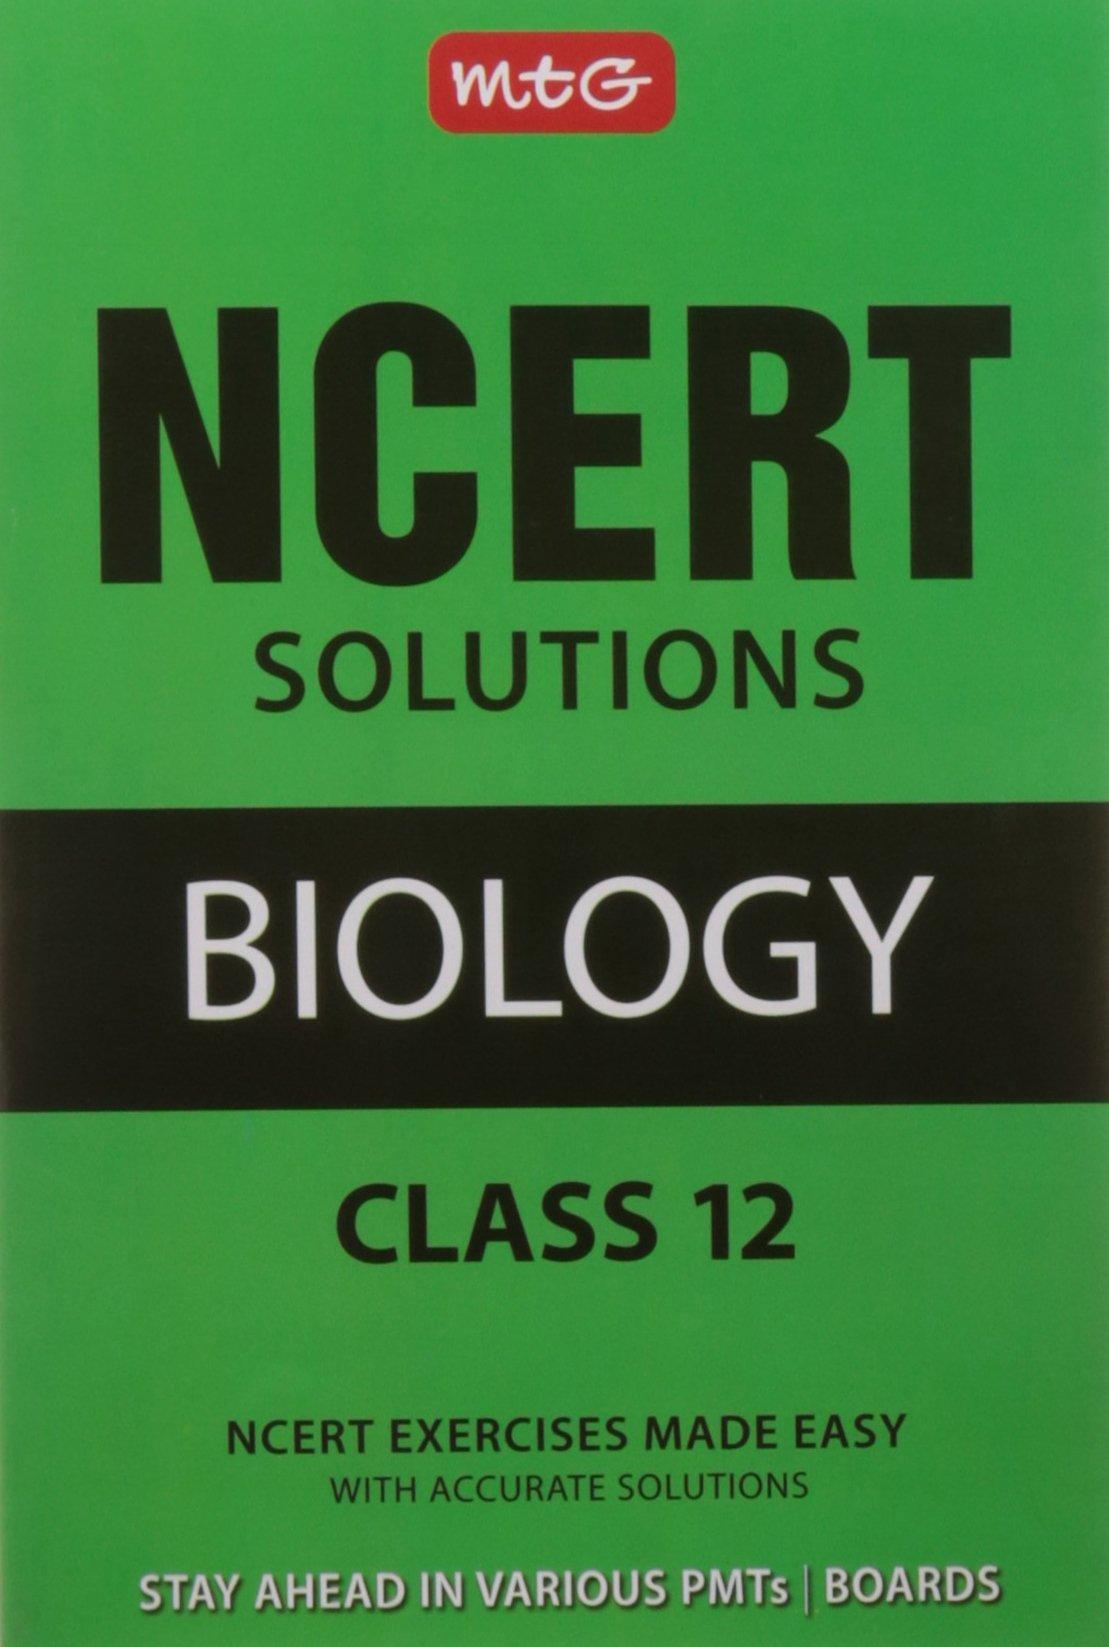 Download NCERT Solutions Biology Class-12 PB PDF